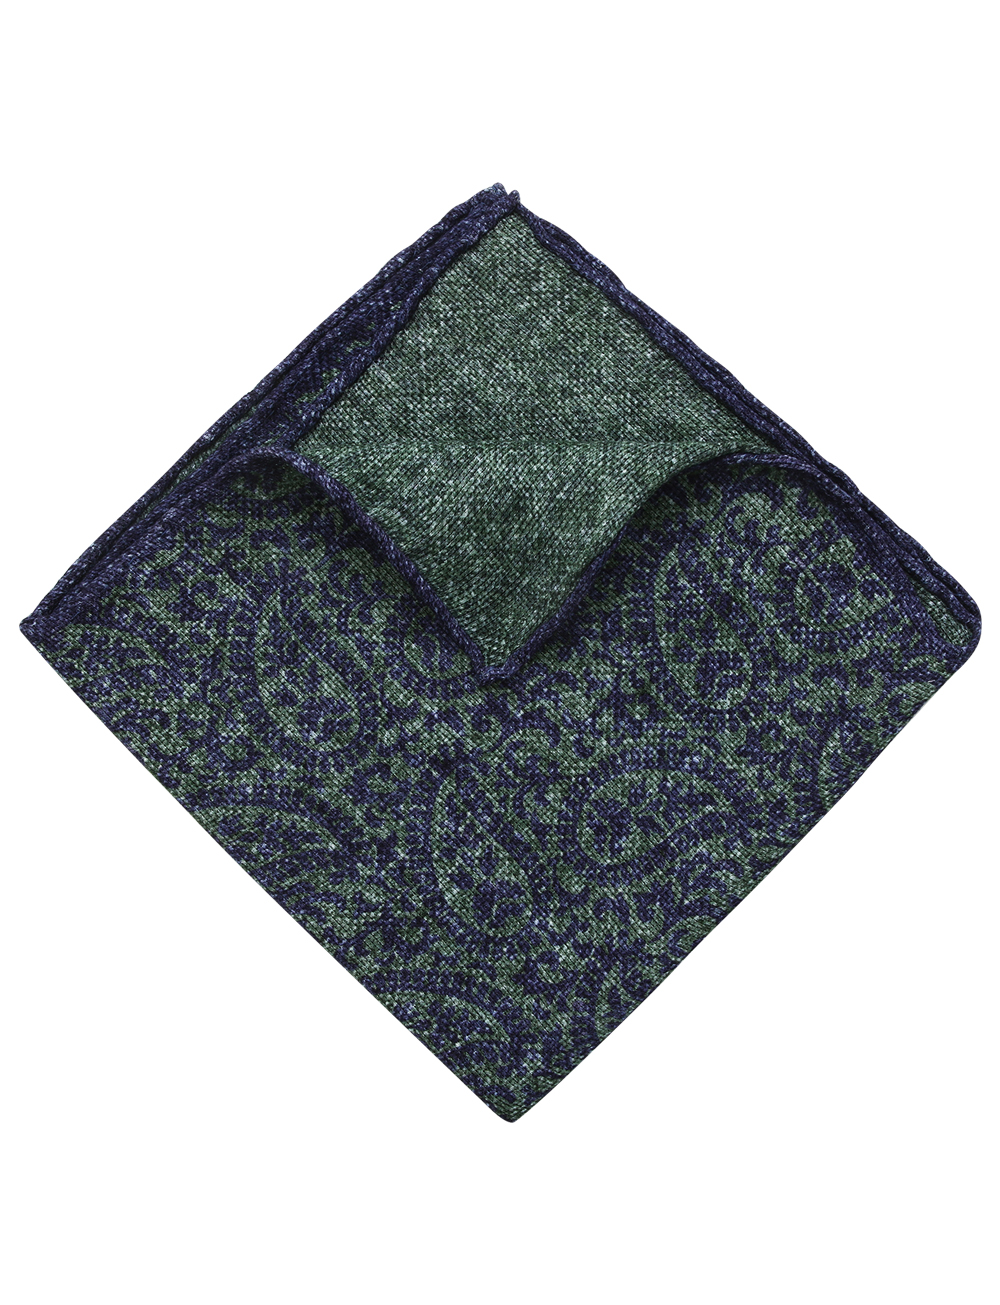 Pochette motif paisley en lin et coton – vert indigo   Cadot f4eeabe0b43